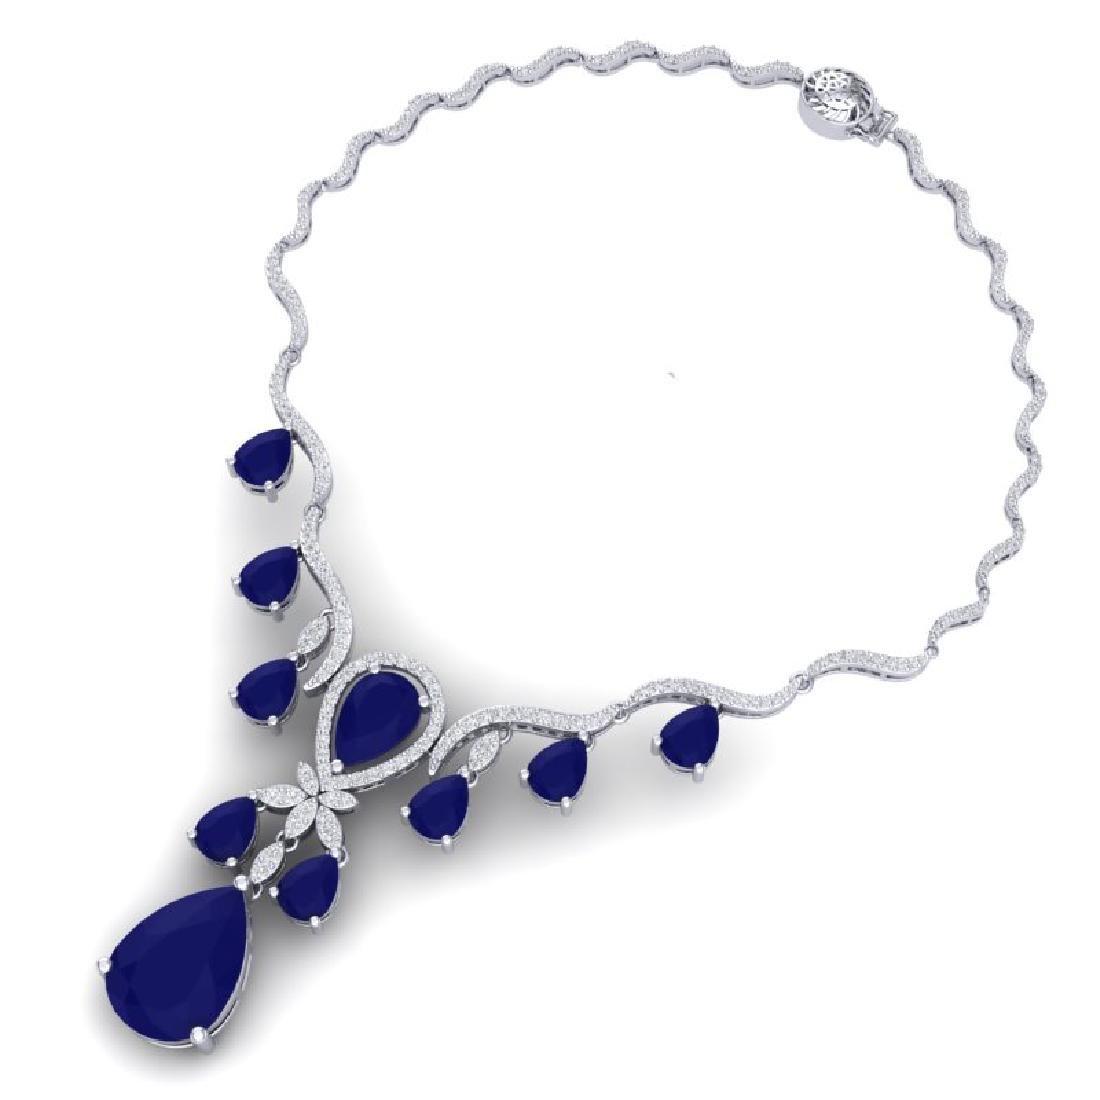 36.14 CTW Royalty Sapphire & VS Diamond Necklace 18K - 3